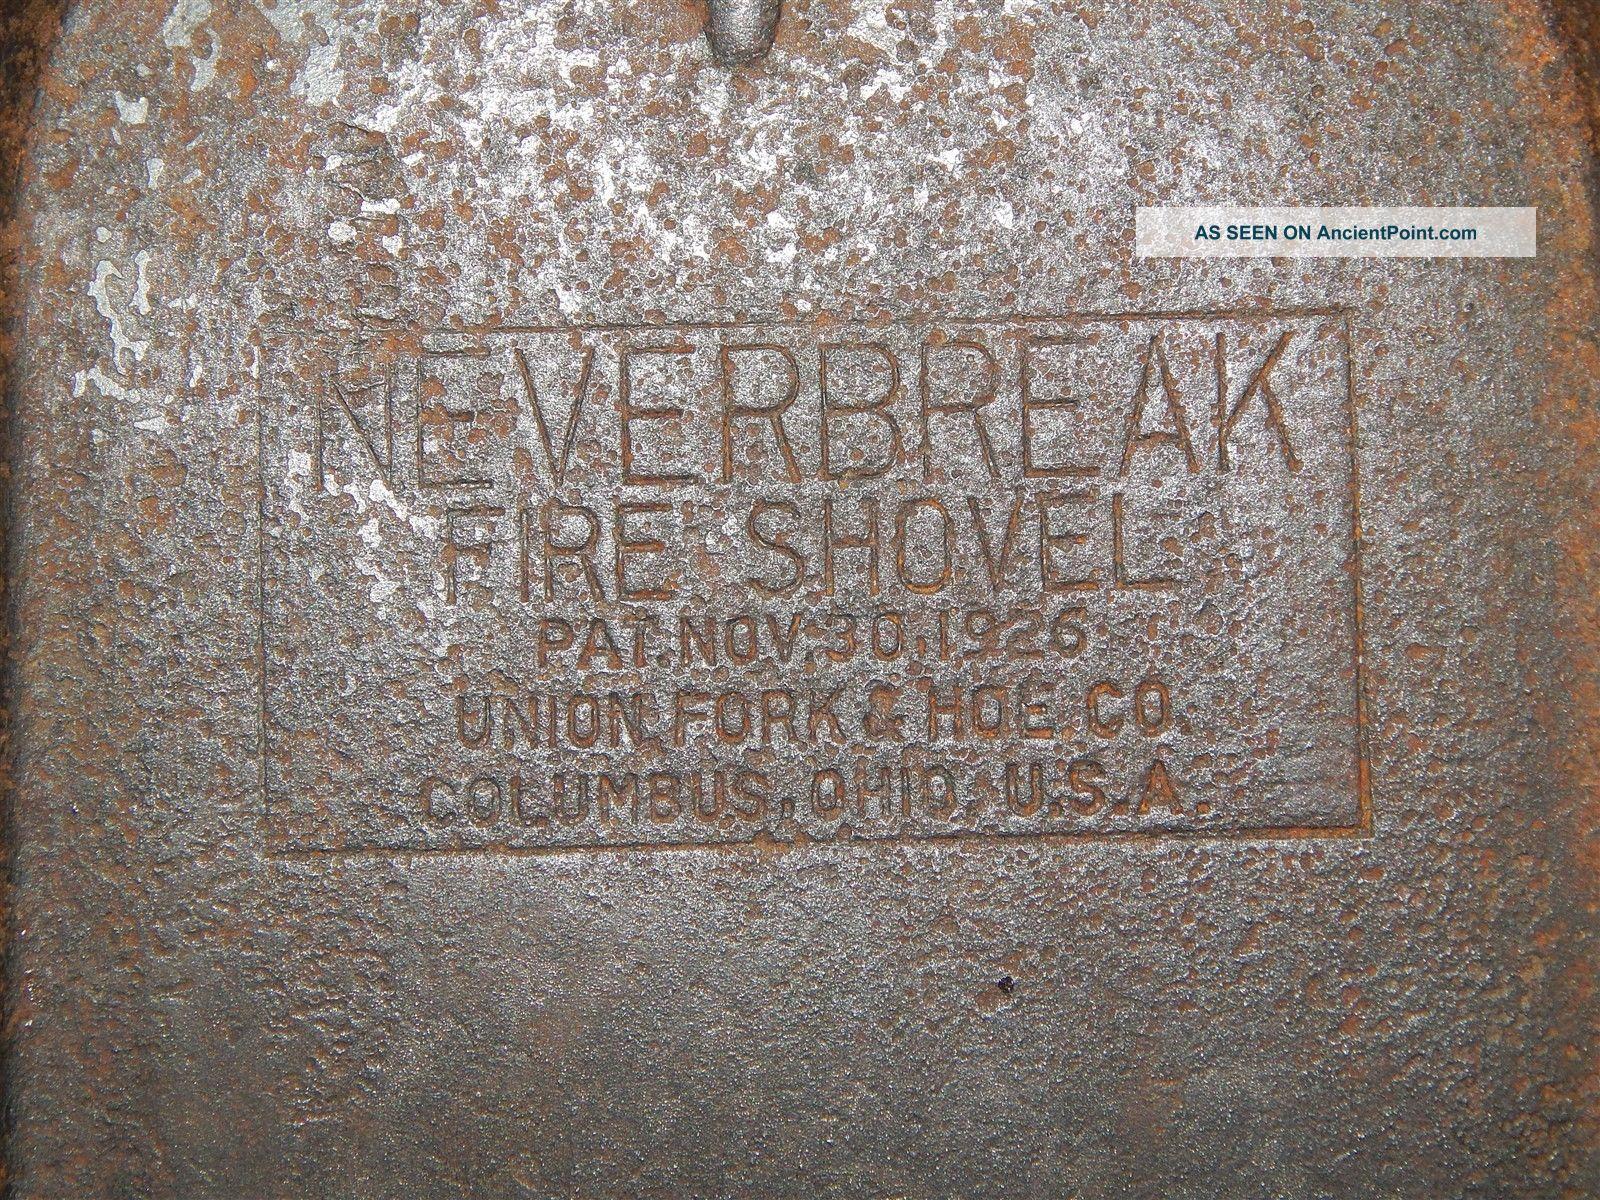 Vntg Primitive Neverbreak Pat 1926 Coal Fireplace Ash Shovel 23 1/2